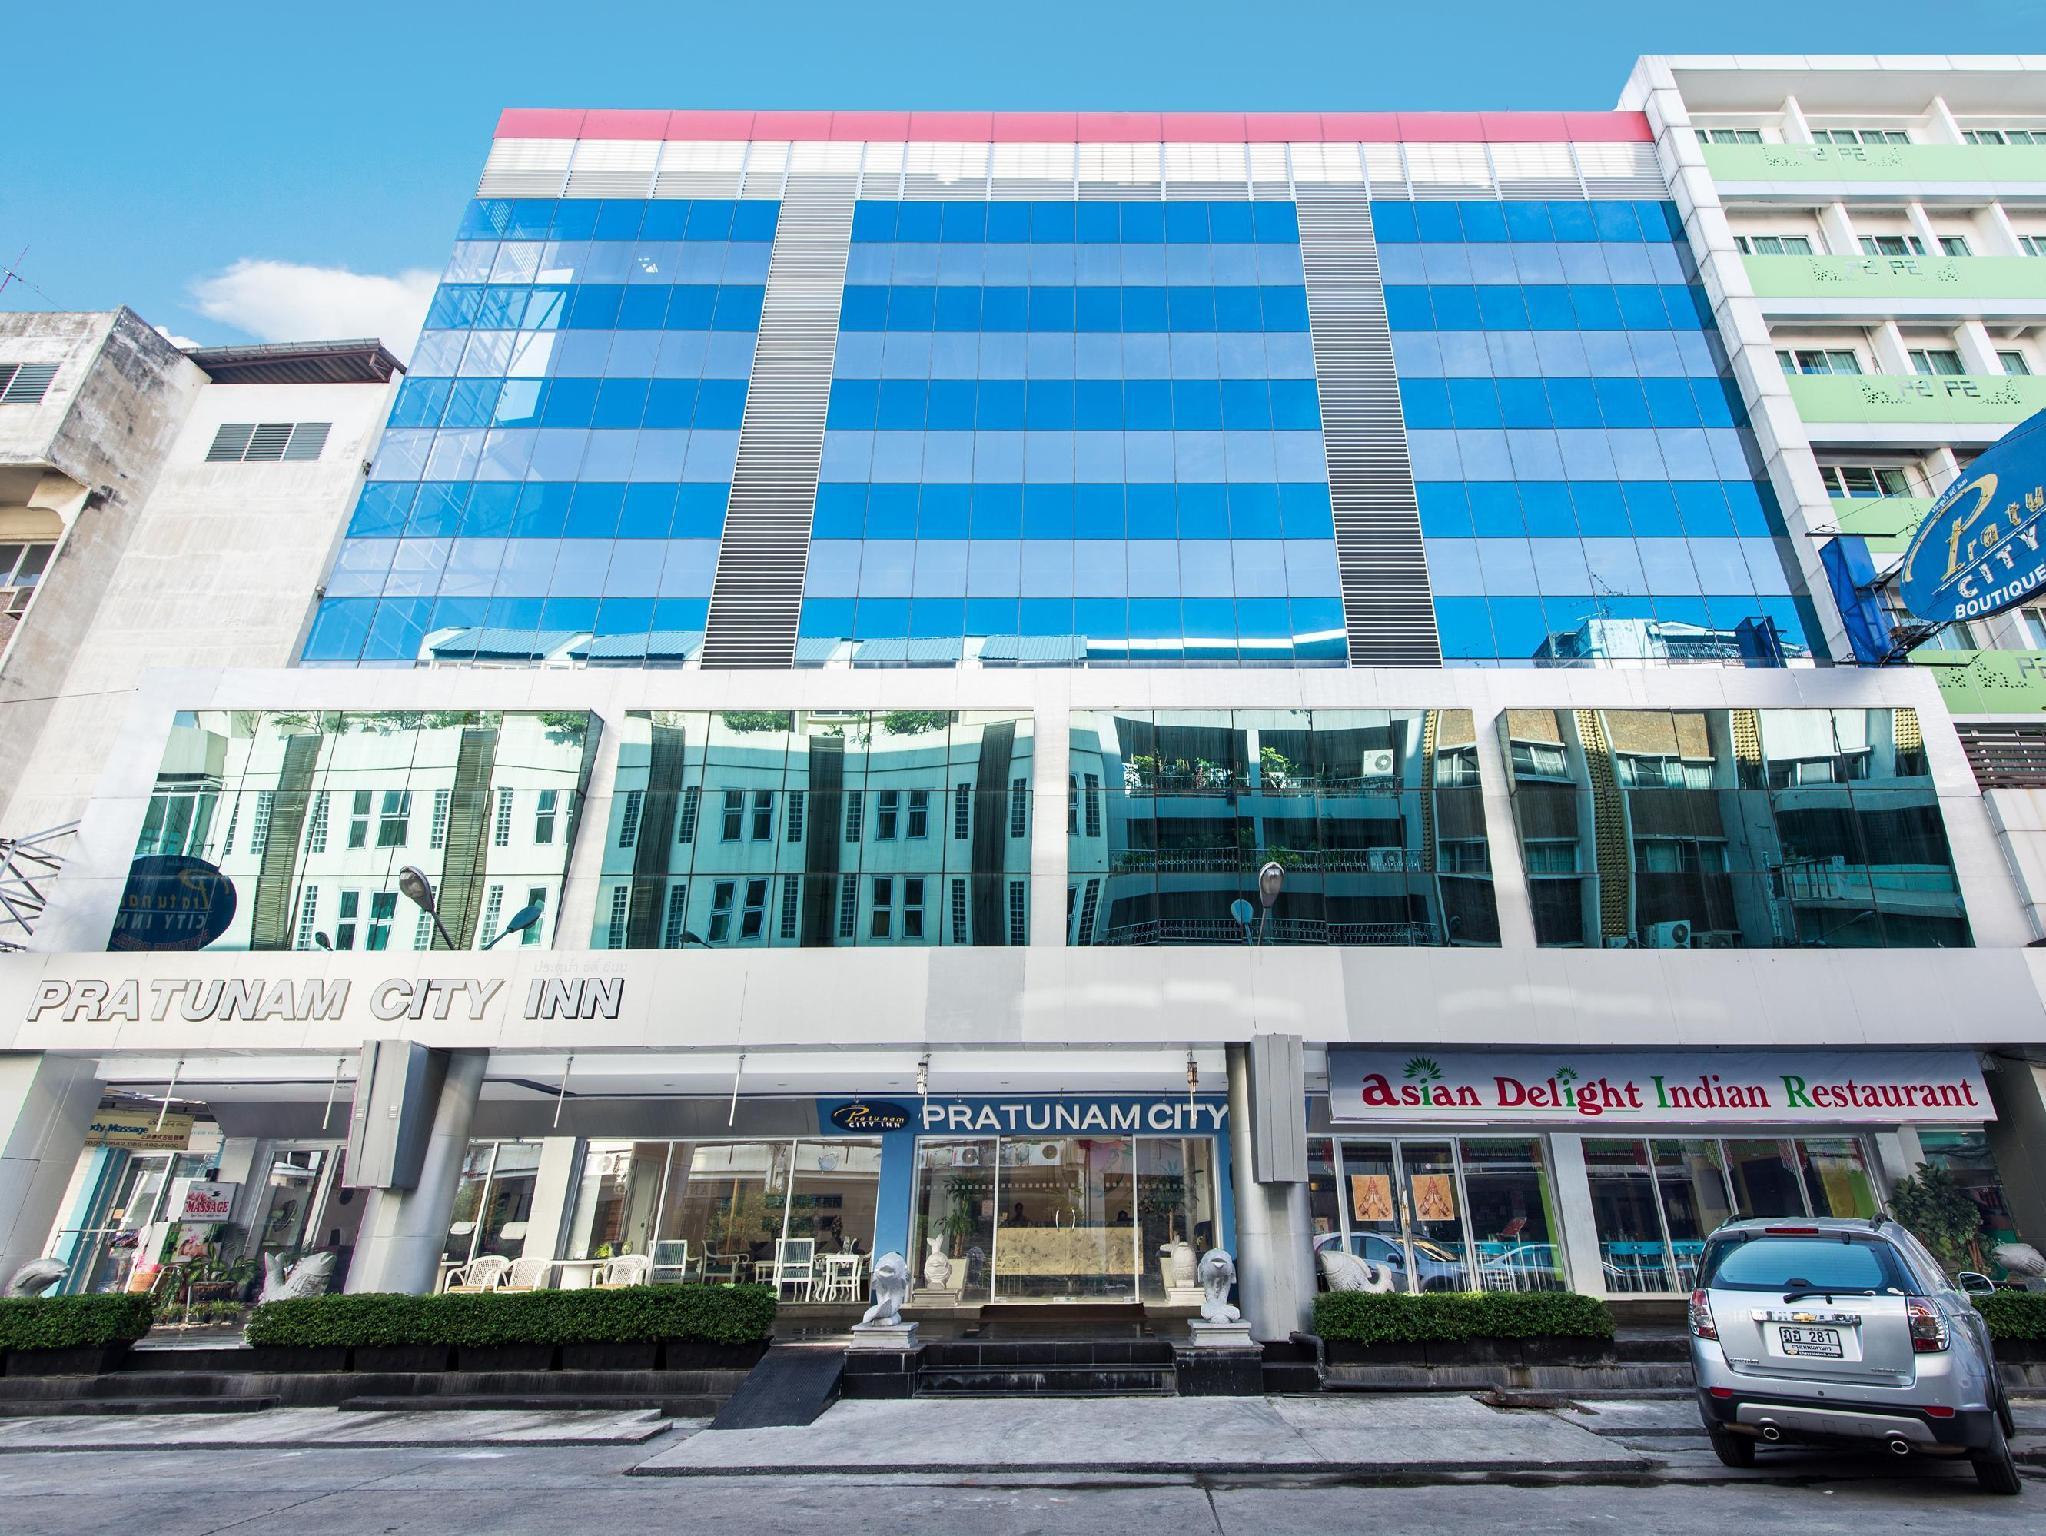 Pratunam City Inn Hotel - Hotels and Accommodation in Thailand, Asia